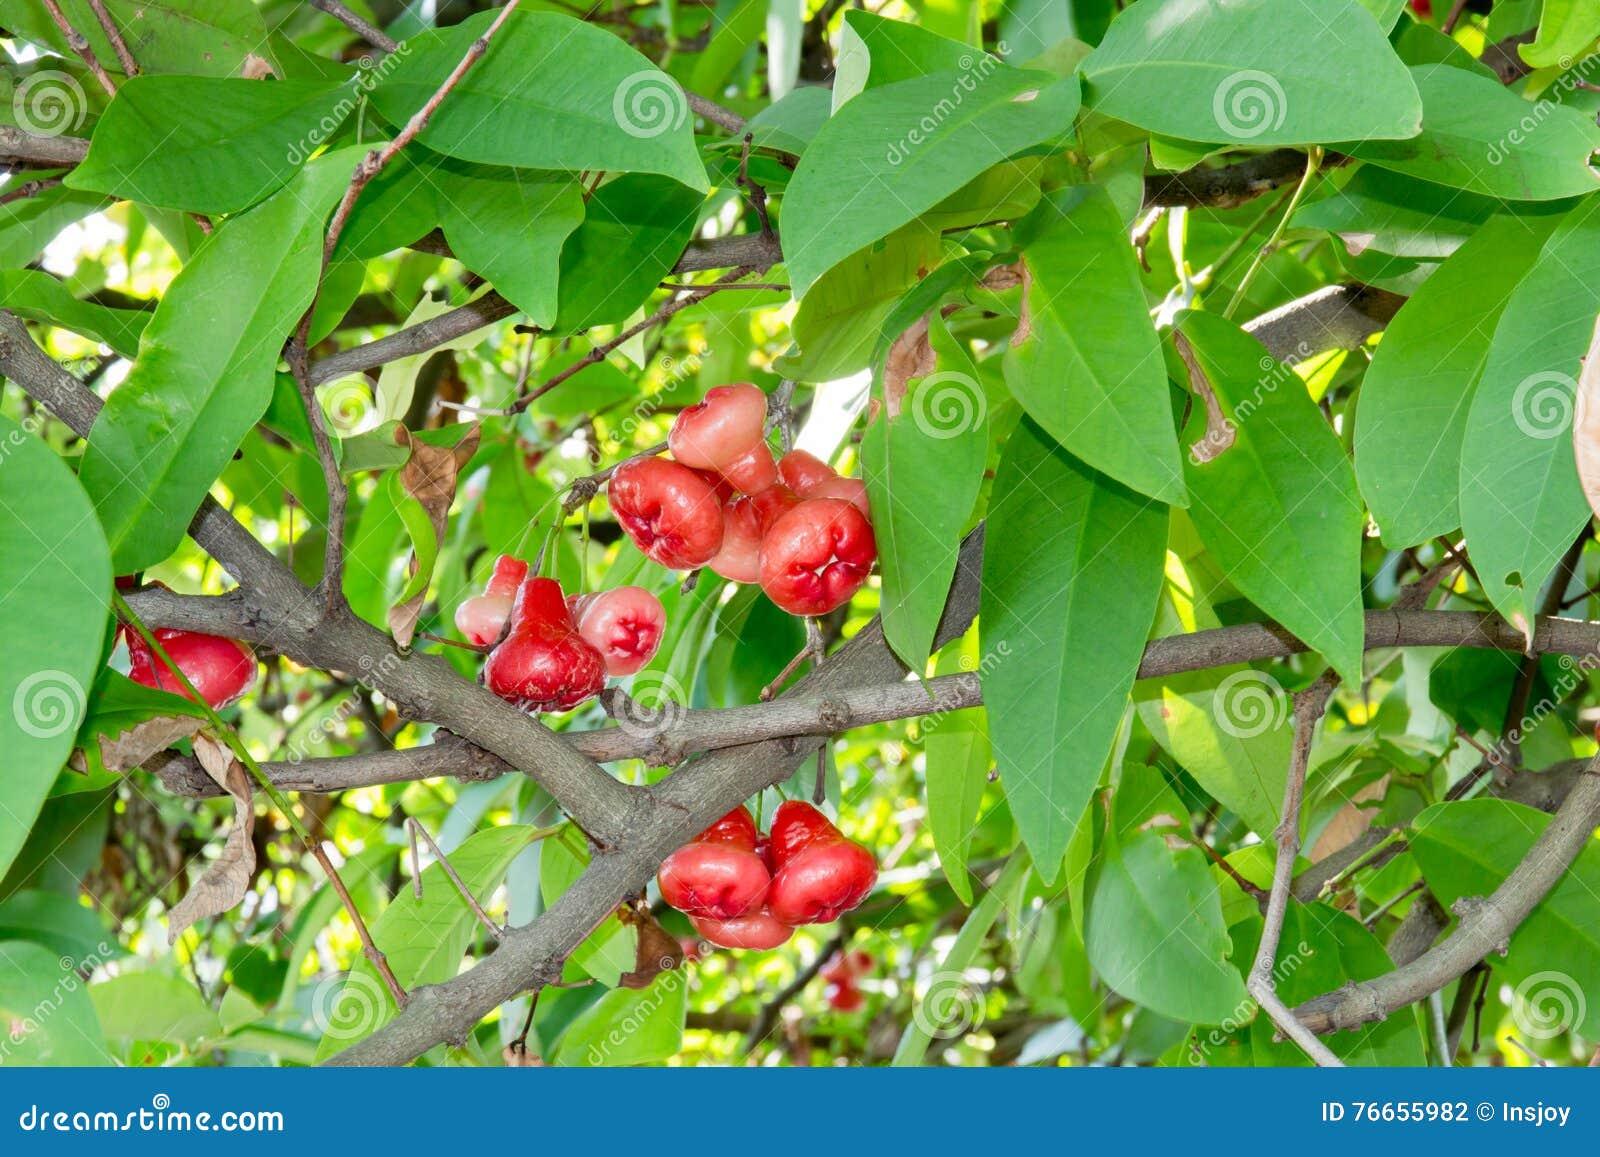 Wax apple stock photo  Image of plum, malay, fresh